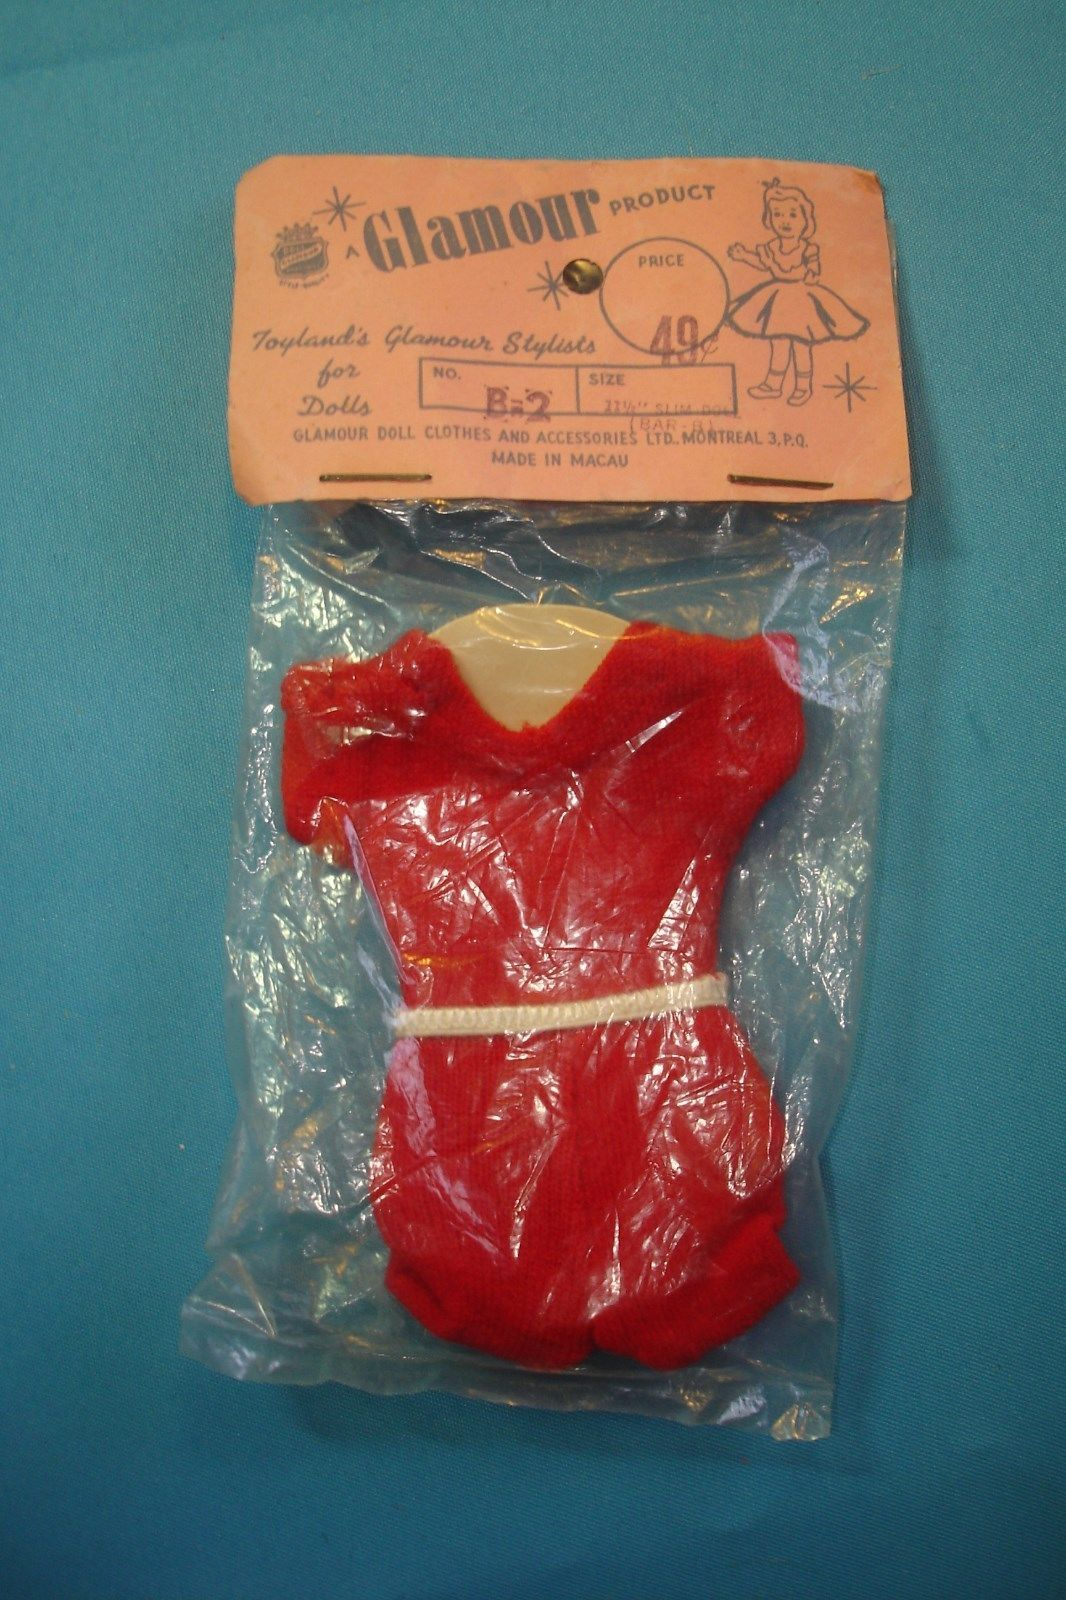 Vintage Barbie Sized Doll Clone Leotard NRFP Vintage 1963 Era | eBay